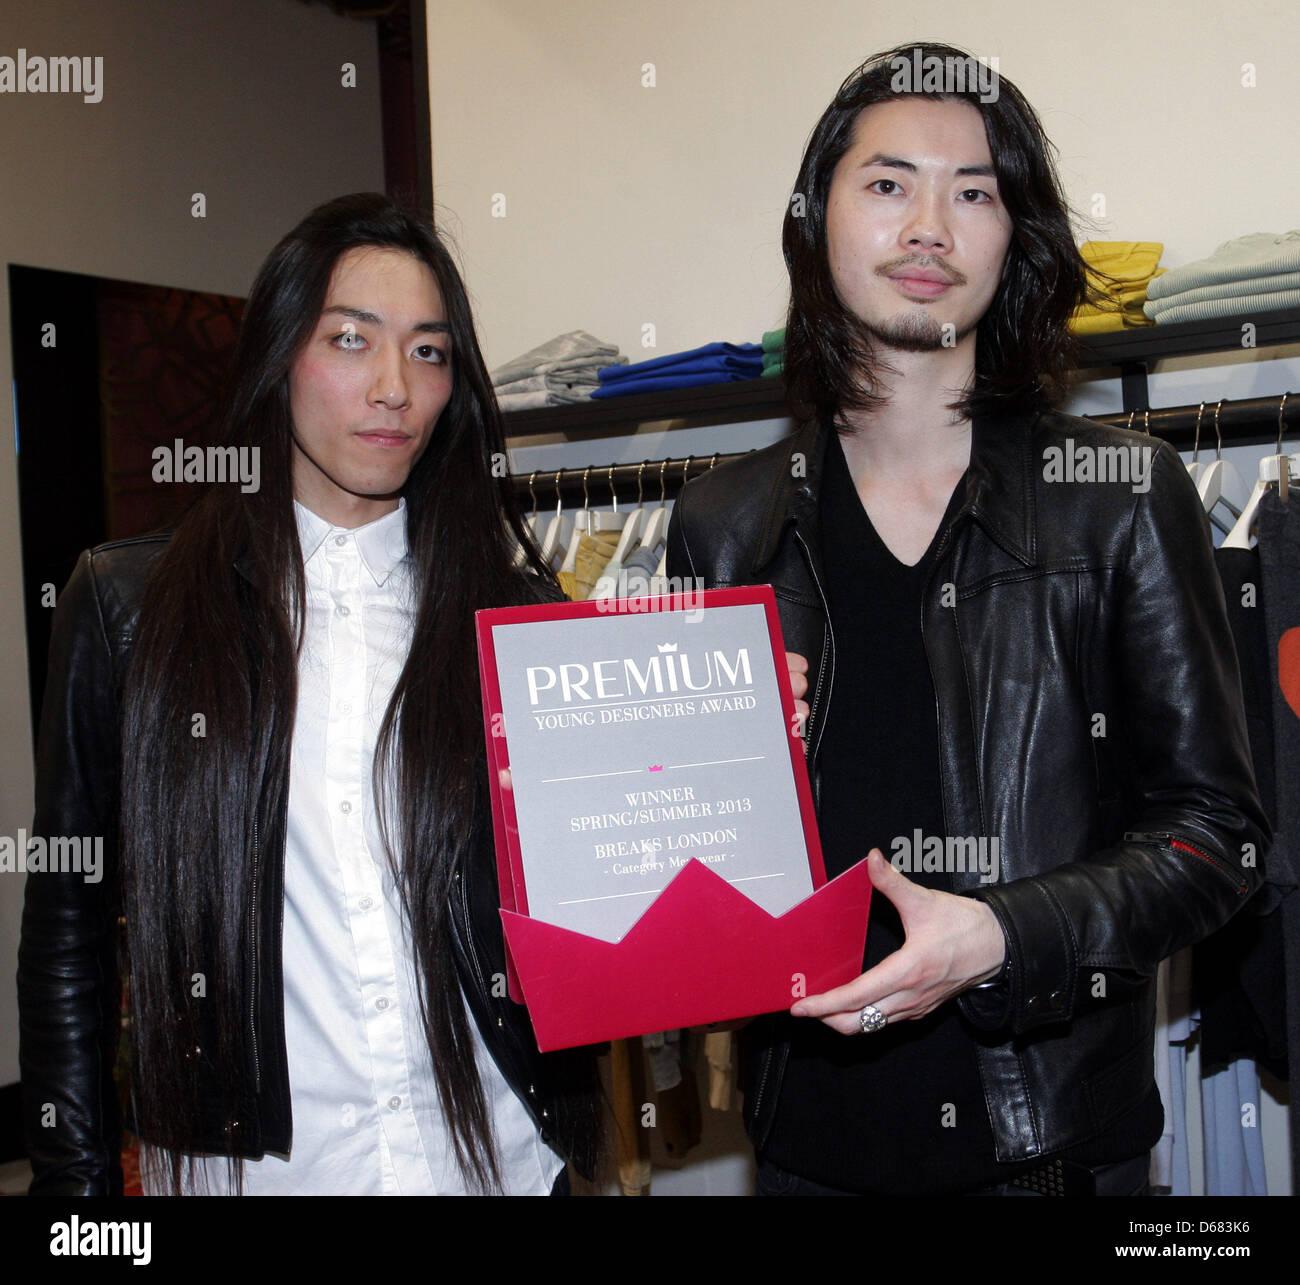 Ryo Yamazaki and Kohji Yanagi of fahion label Label BREAKS London receive the Premium Young Designers Award in the - Stock Image